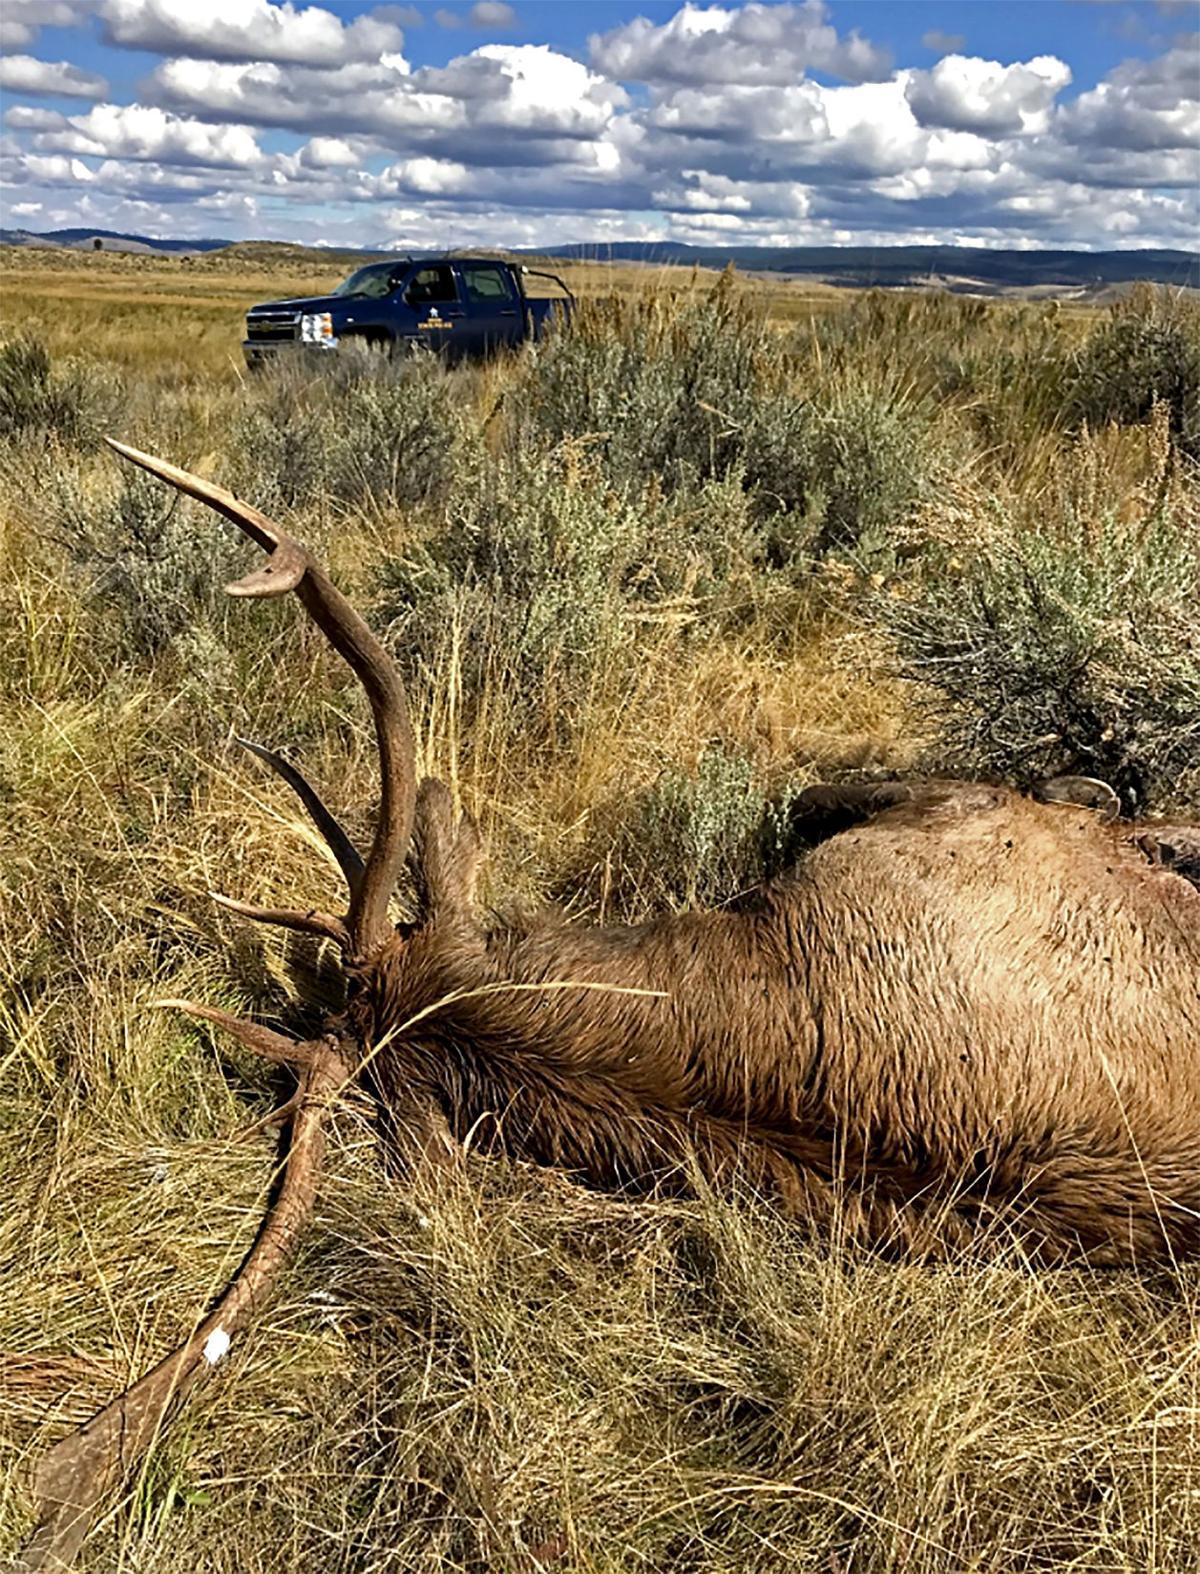 Poachers beware